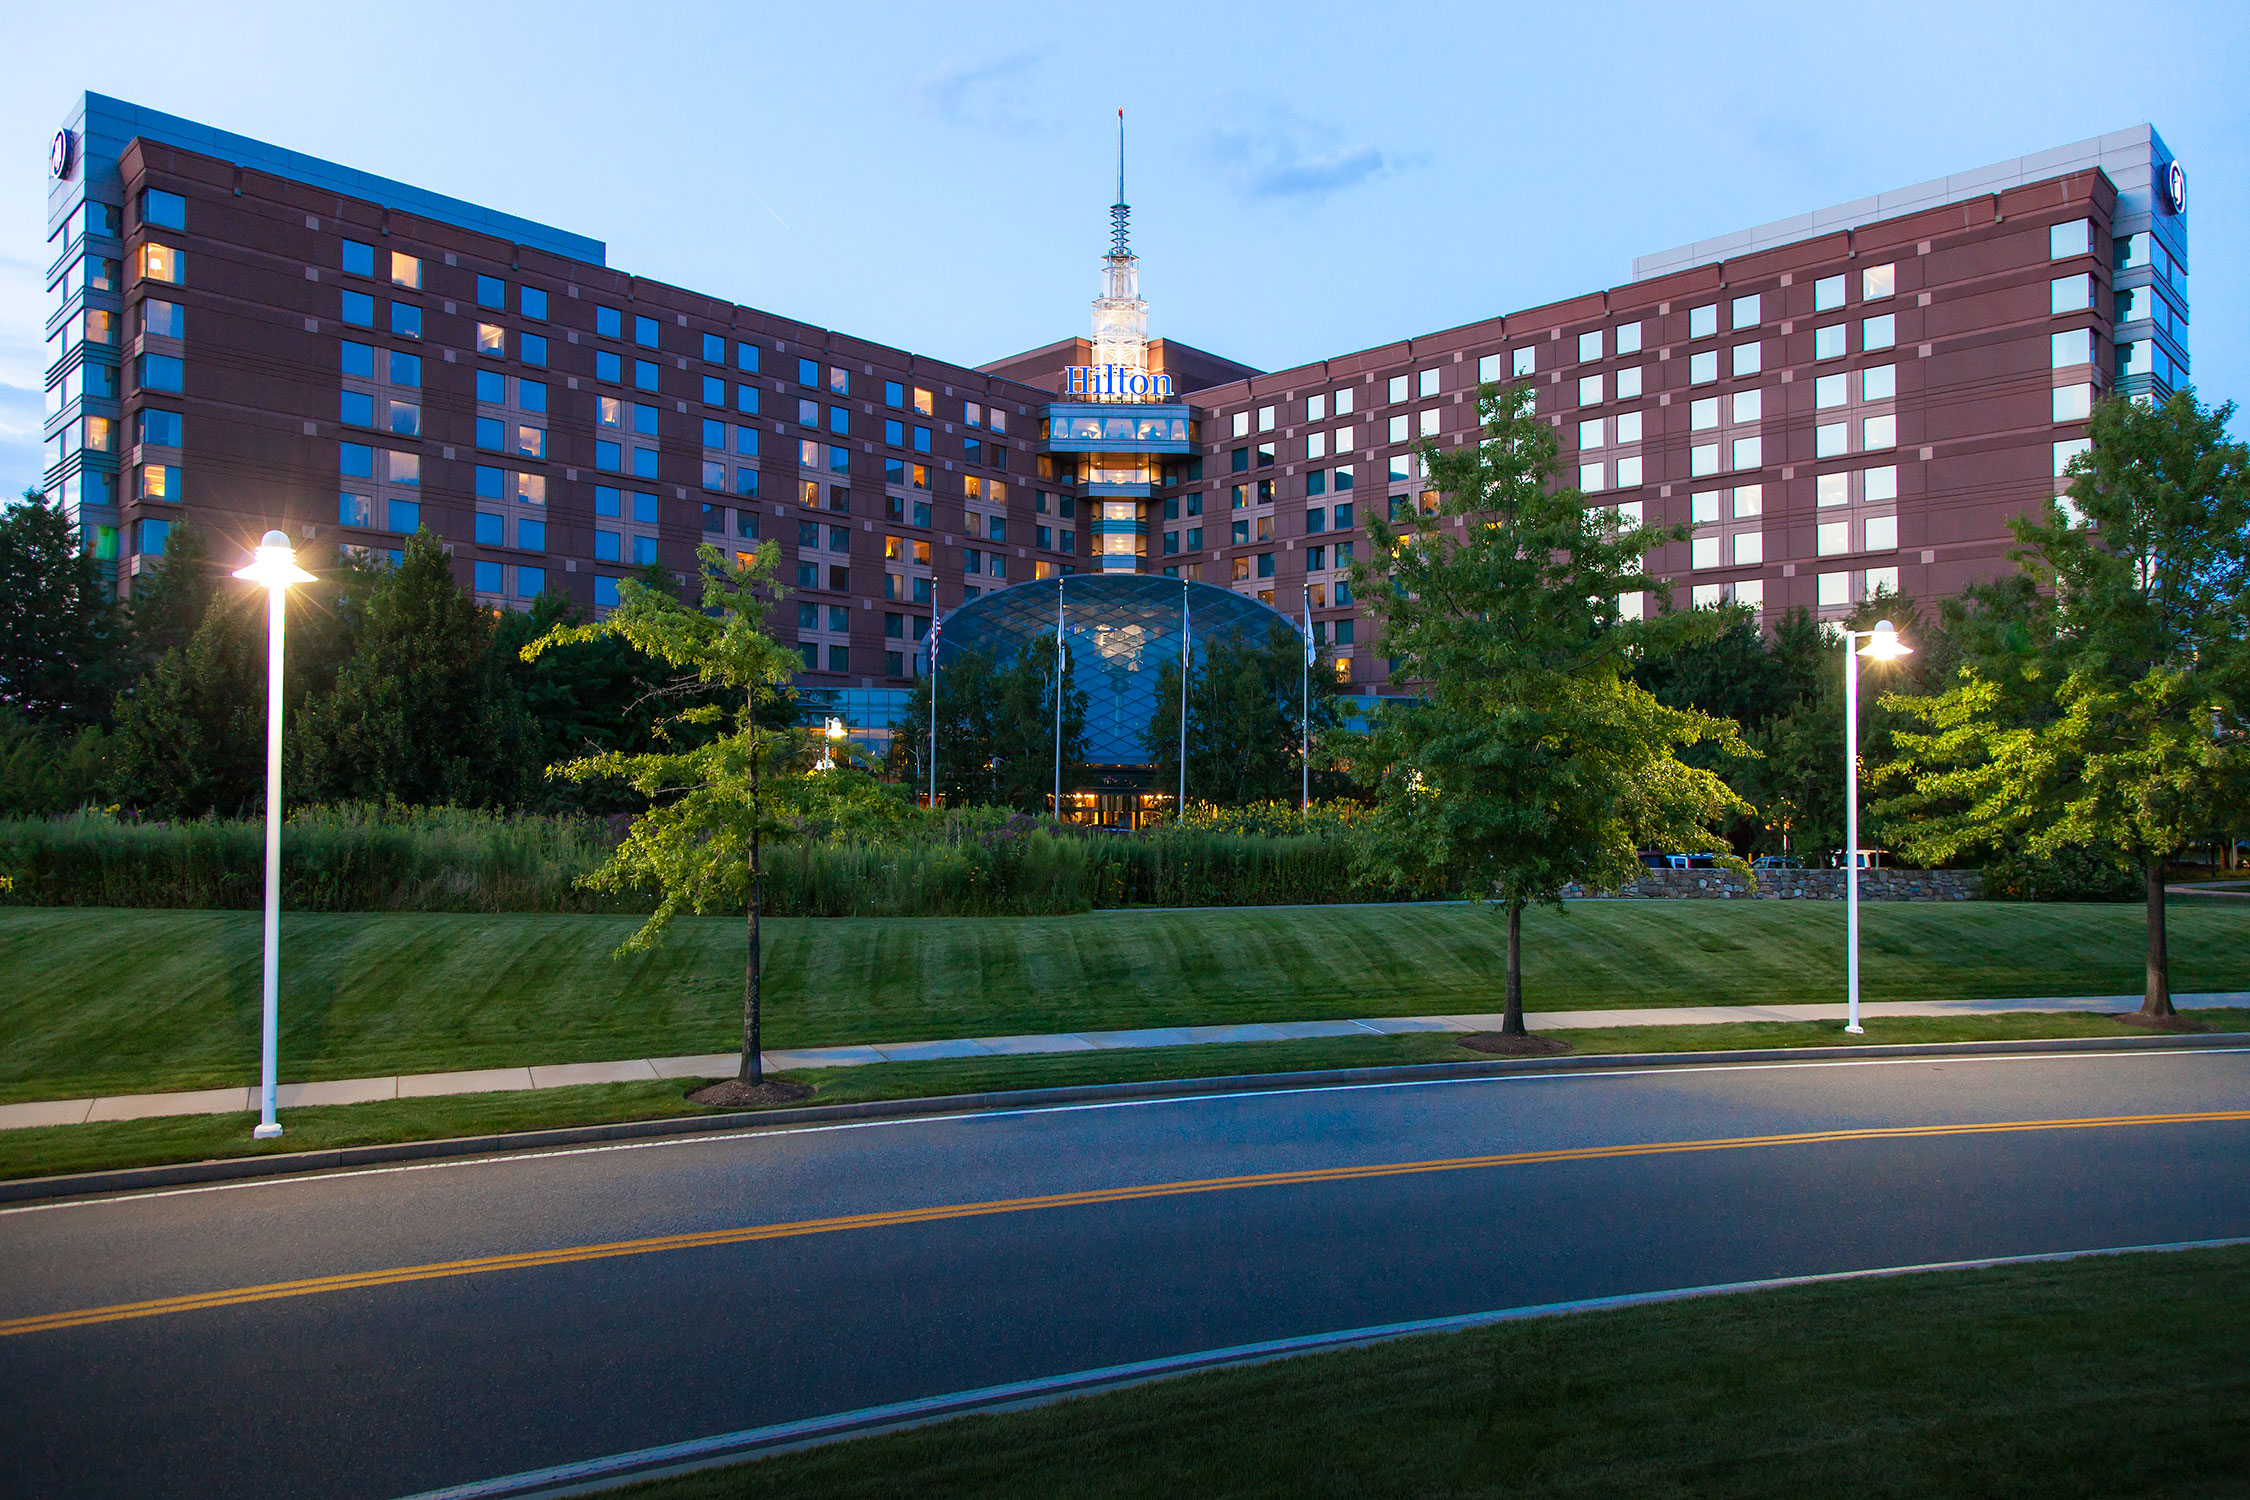 hotels at boston logan international airport. Black Bedroom Furniture Sets. Home Design Ideas